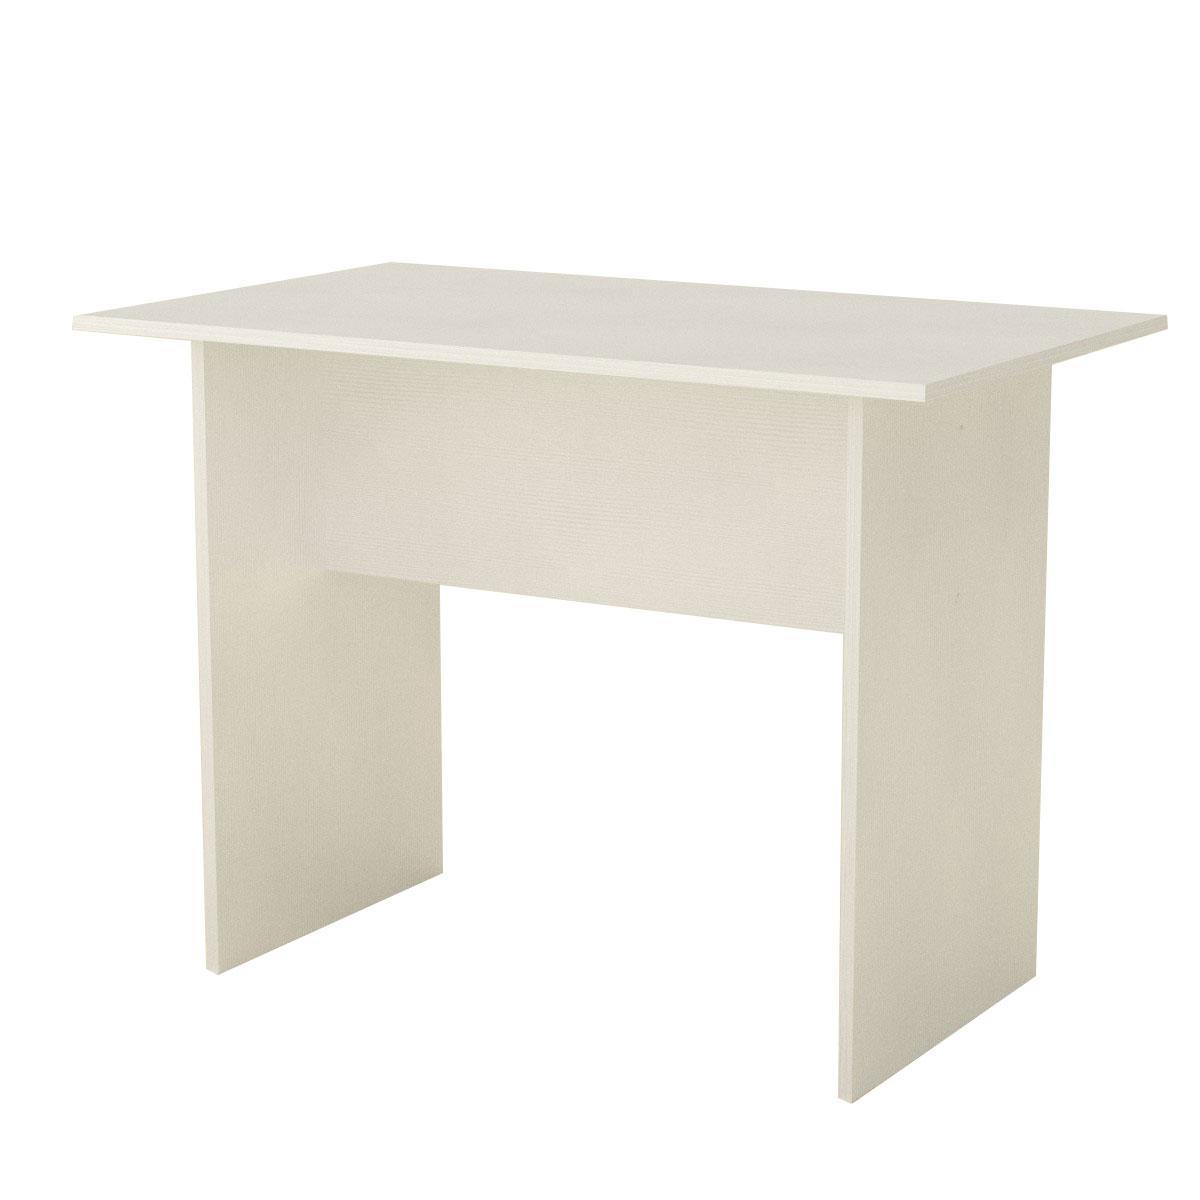 Стол письменный мо-1 белый Компанит (100х60х74 см)